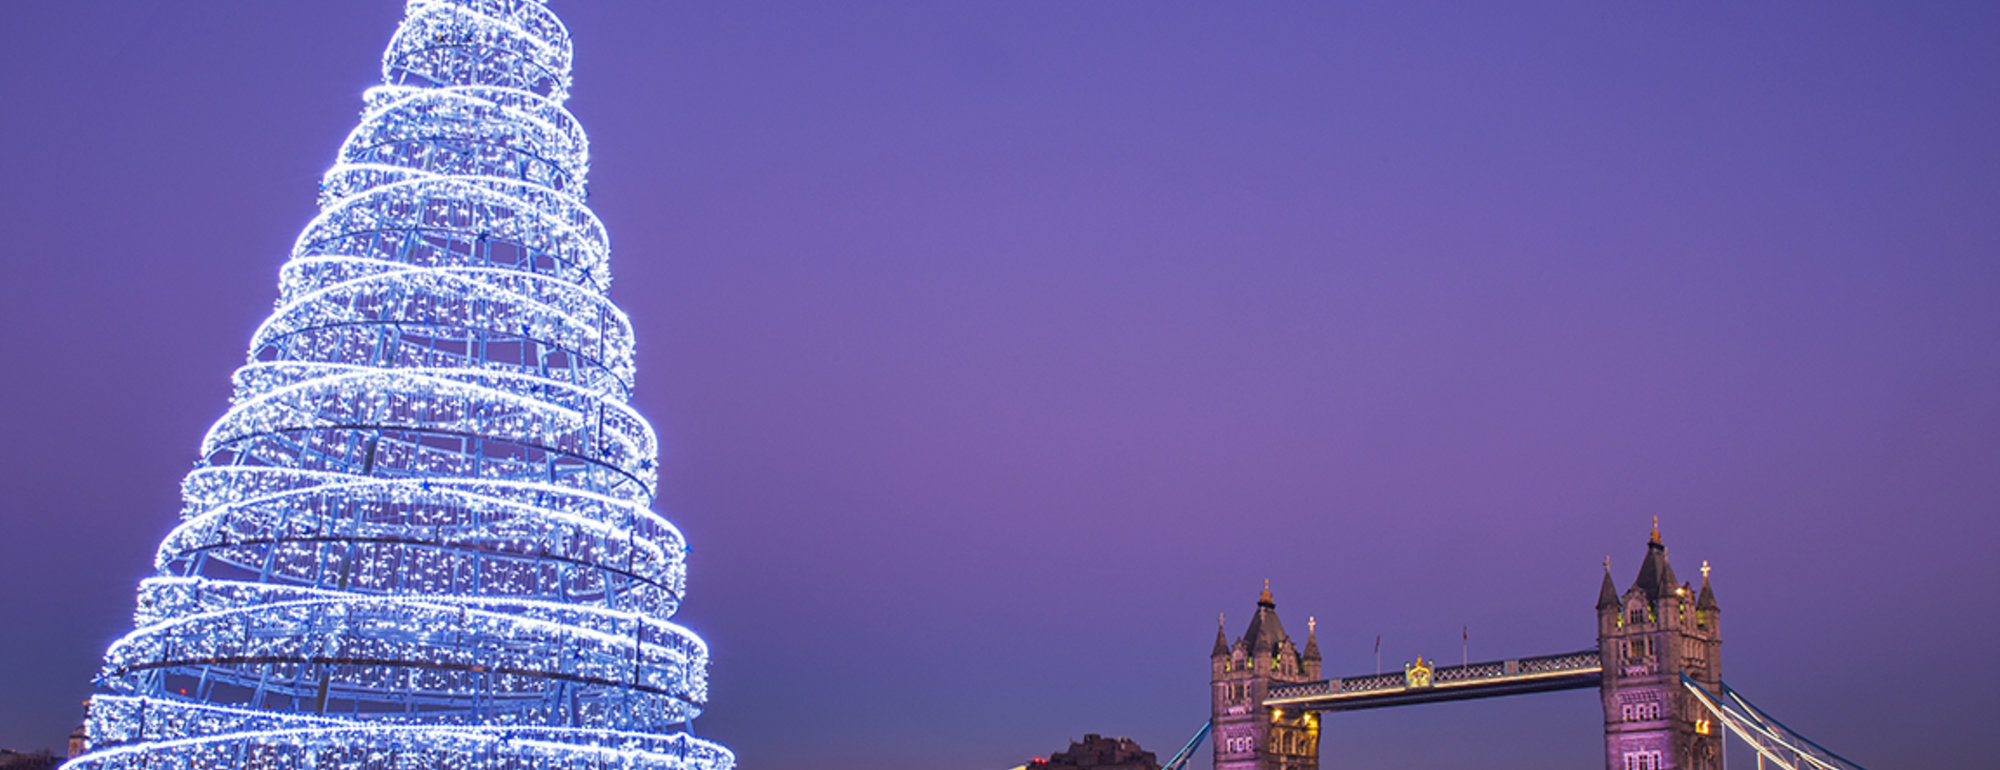 Londen Christmas Towerbridge